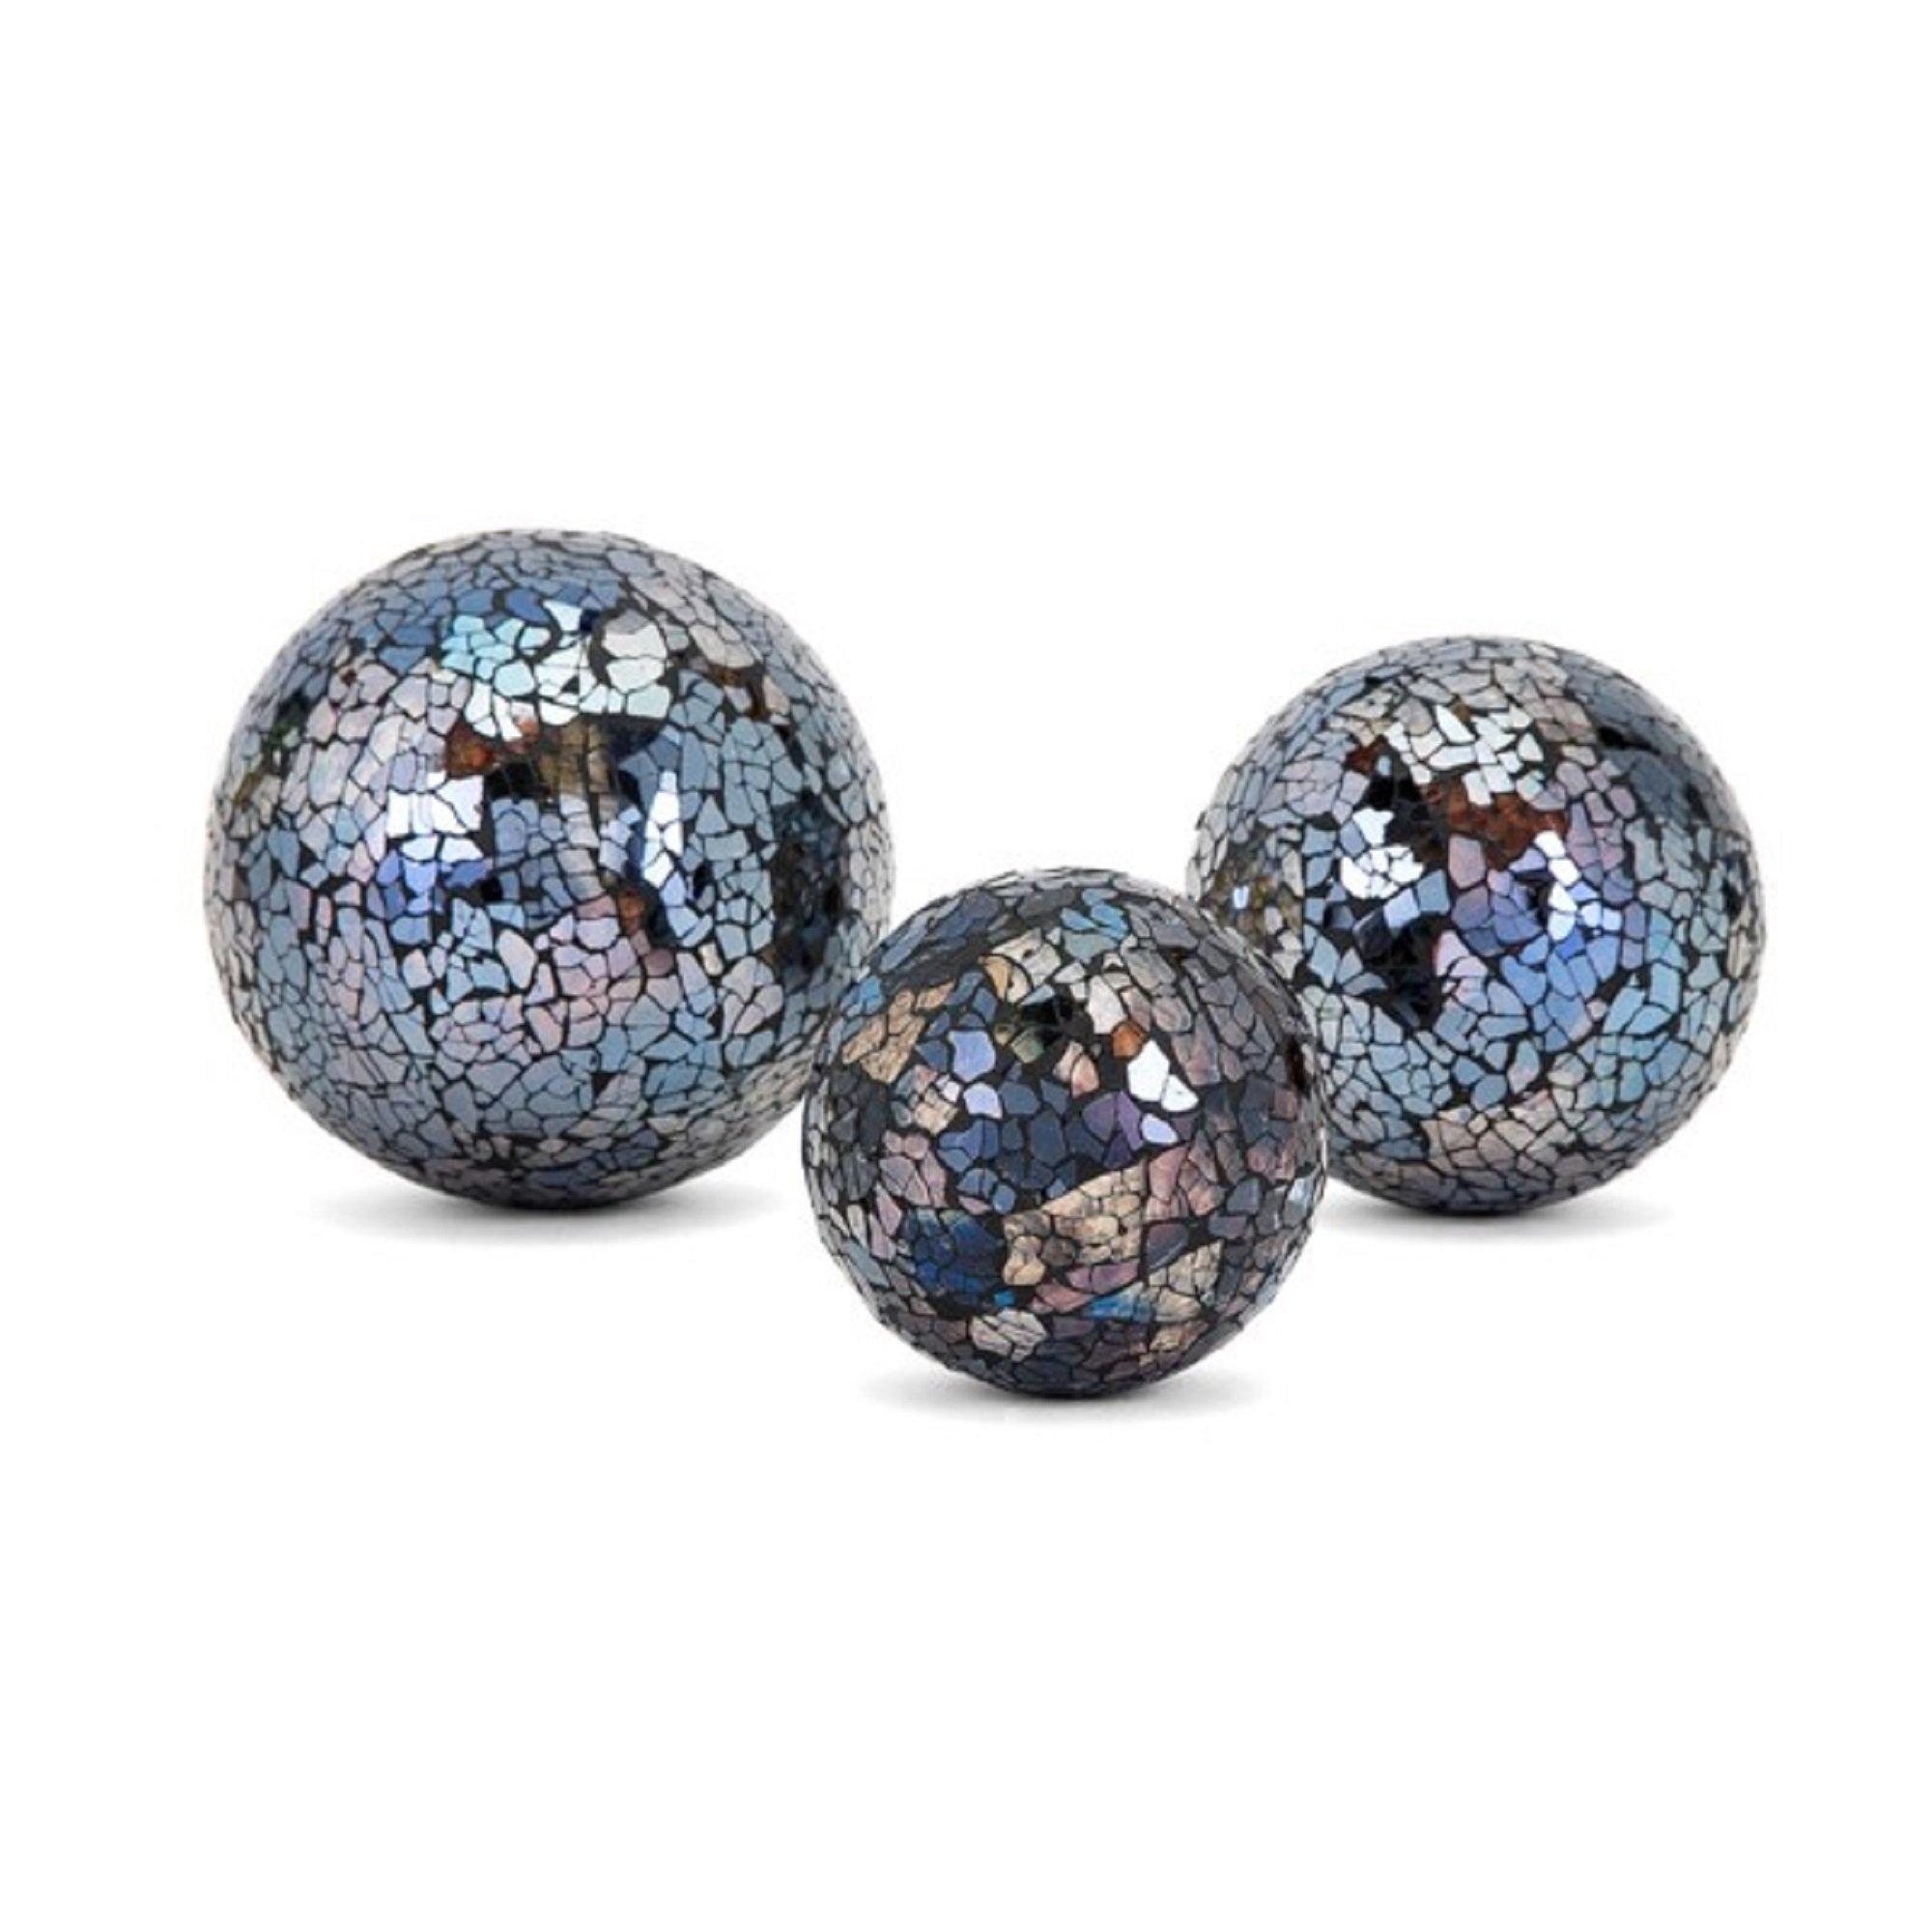 CC Home Furnishings Set of 3 Blue Mosaic Deco Ball Decorations 5''